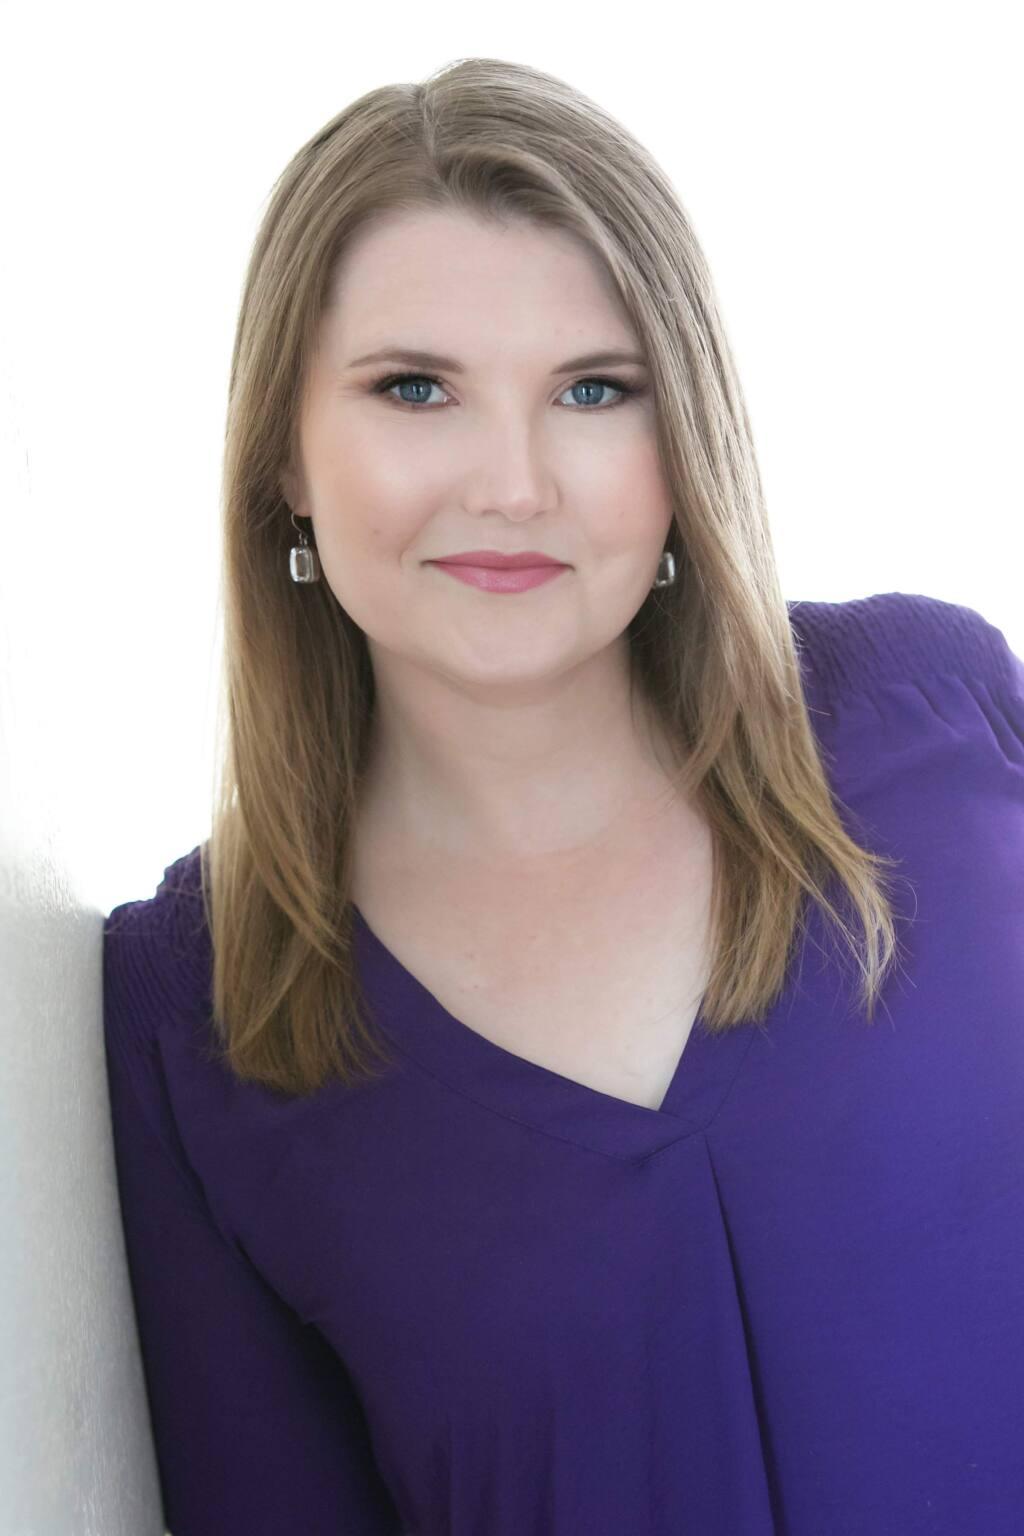 Teresa Scott, 32, workforce health supervisor, St. Joseph Health, is a 2020 Forty Under 40 winner. (Mariah Smith Photography)